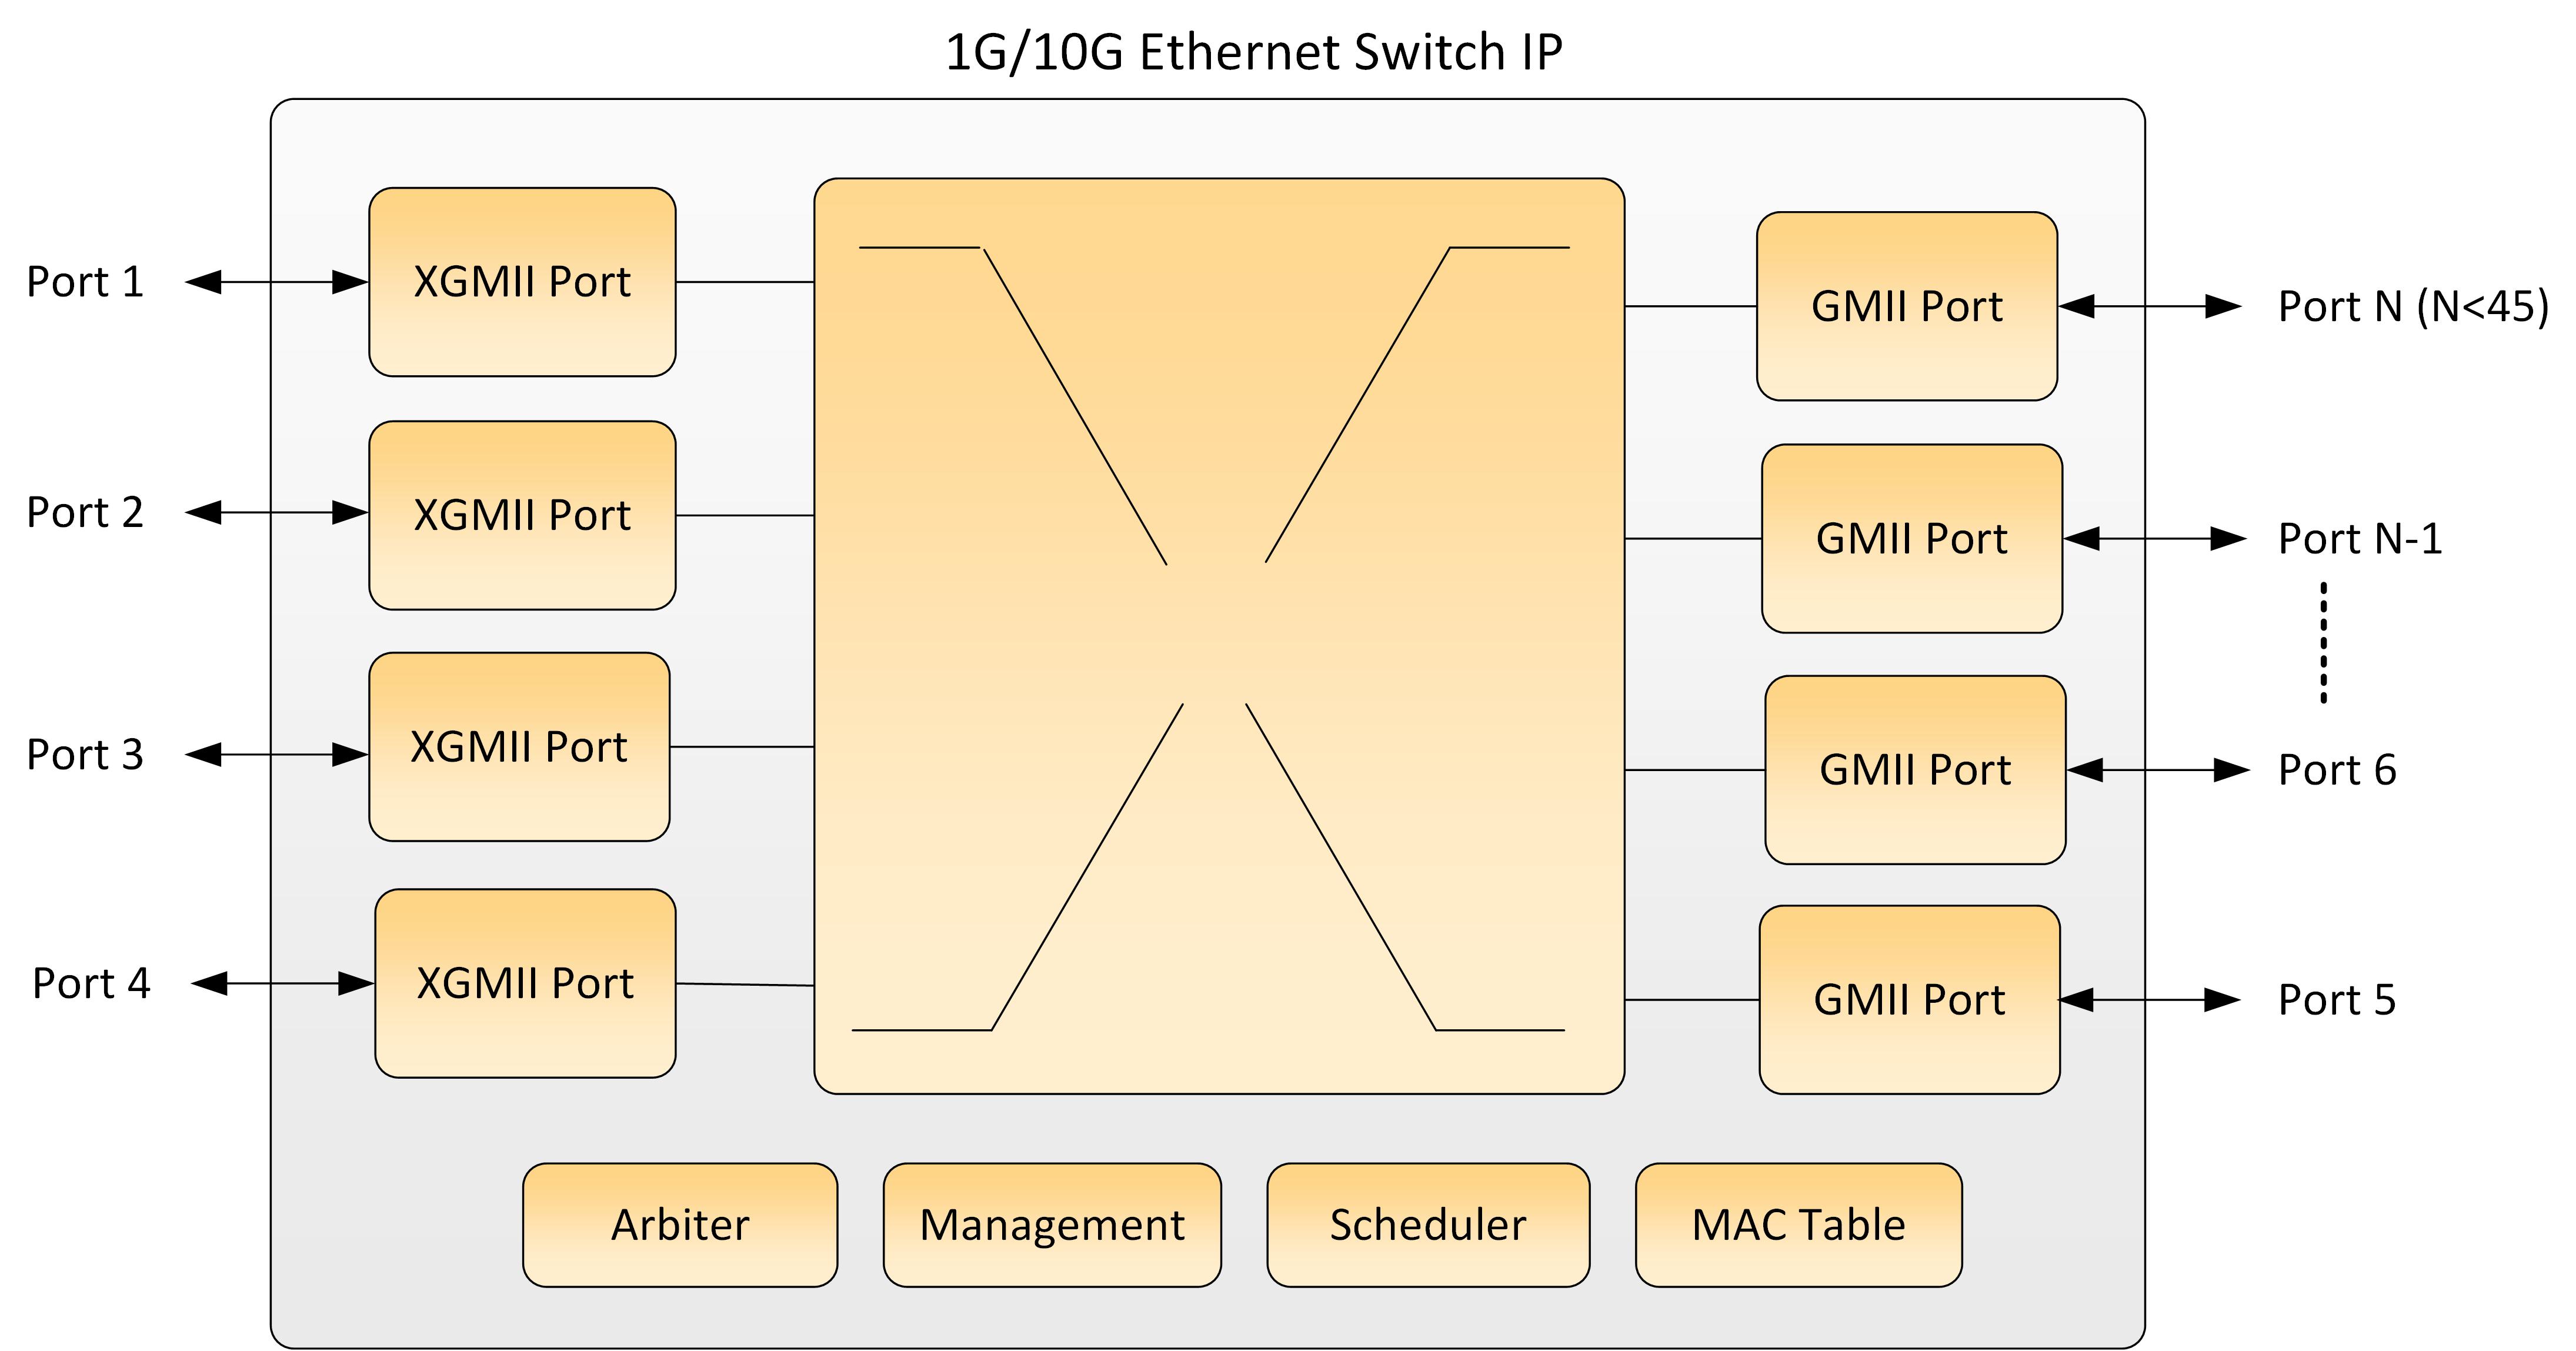 Ethernet Switch 1G/10G Block Diagram